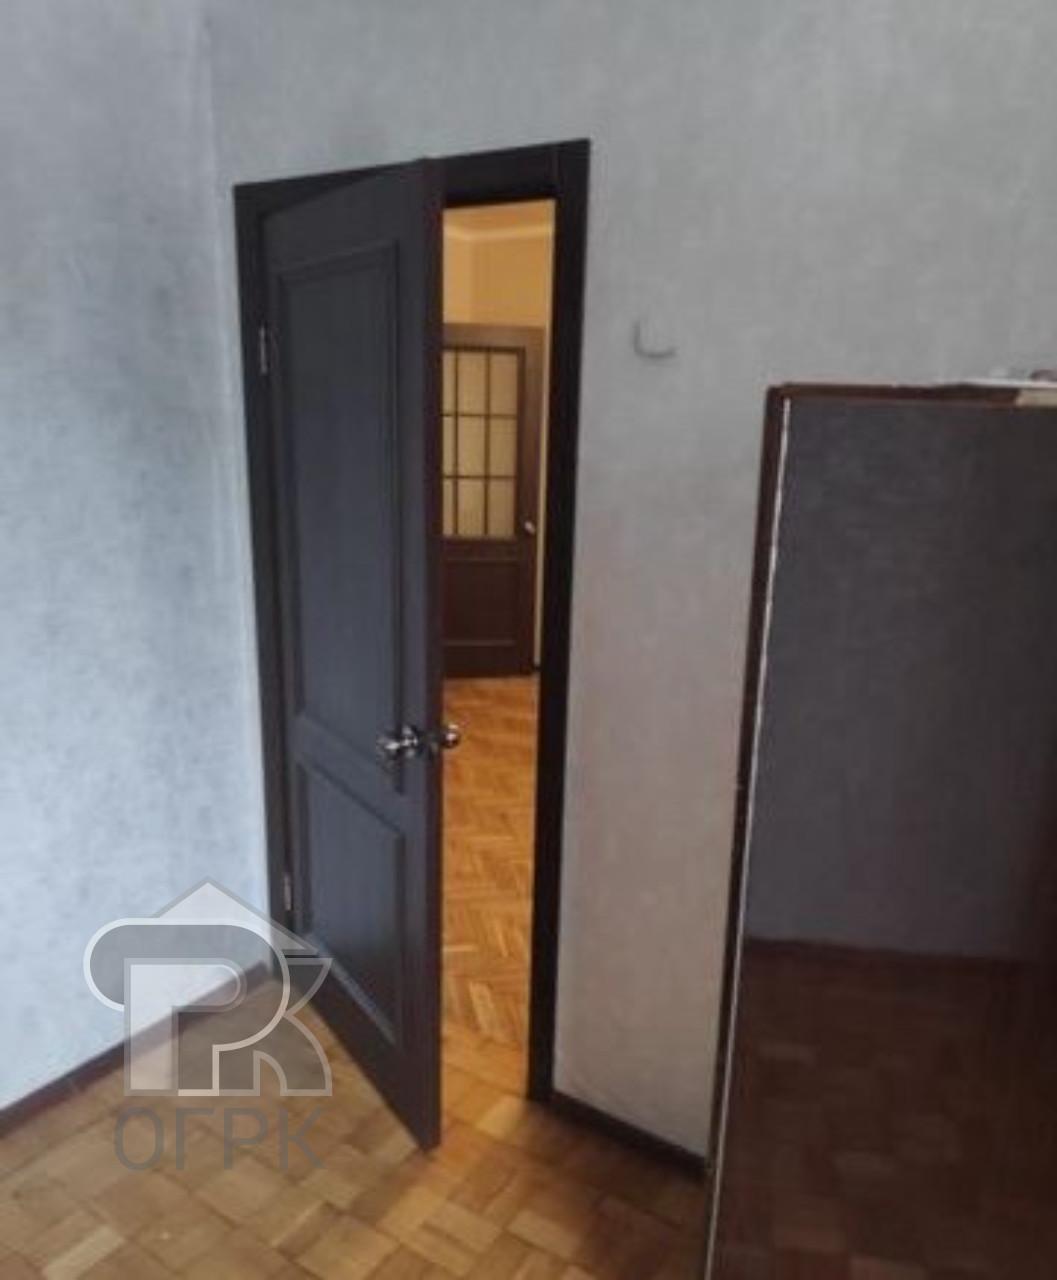 Купить 3-комнатную квартиру, город Москва, Москва, ул. Старый Гай, д.12, №310295